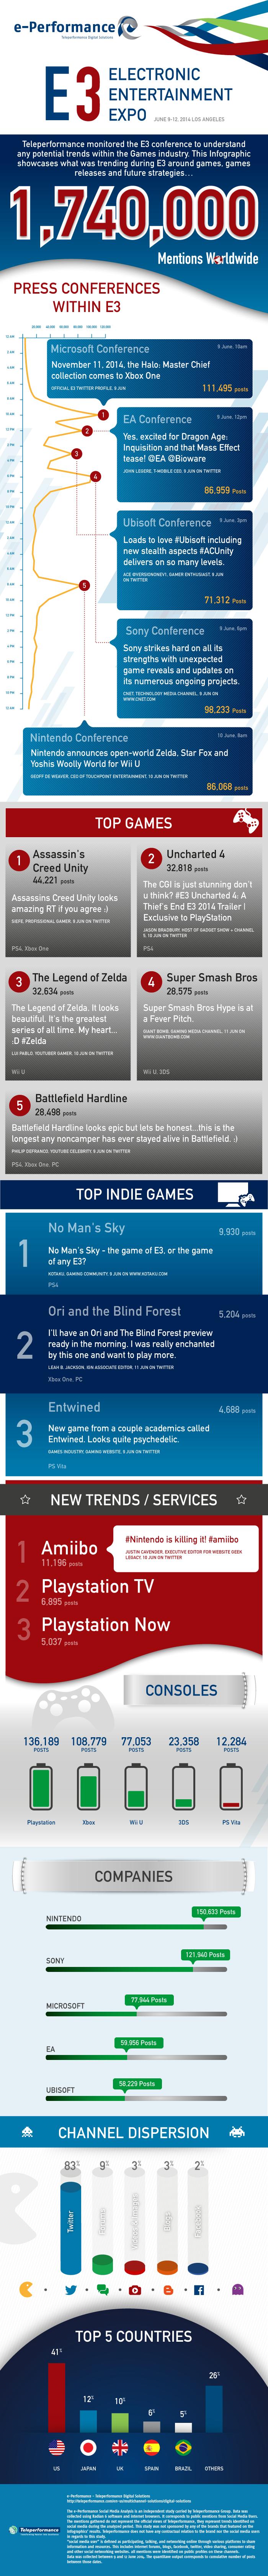 infografica e-perfomance